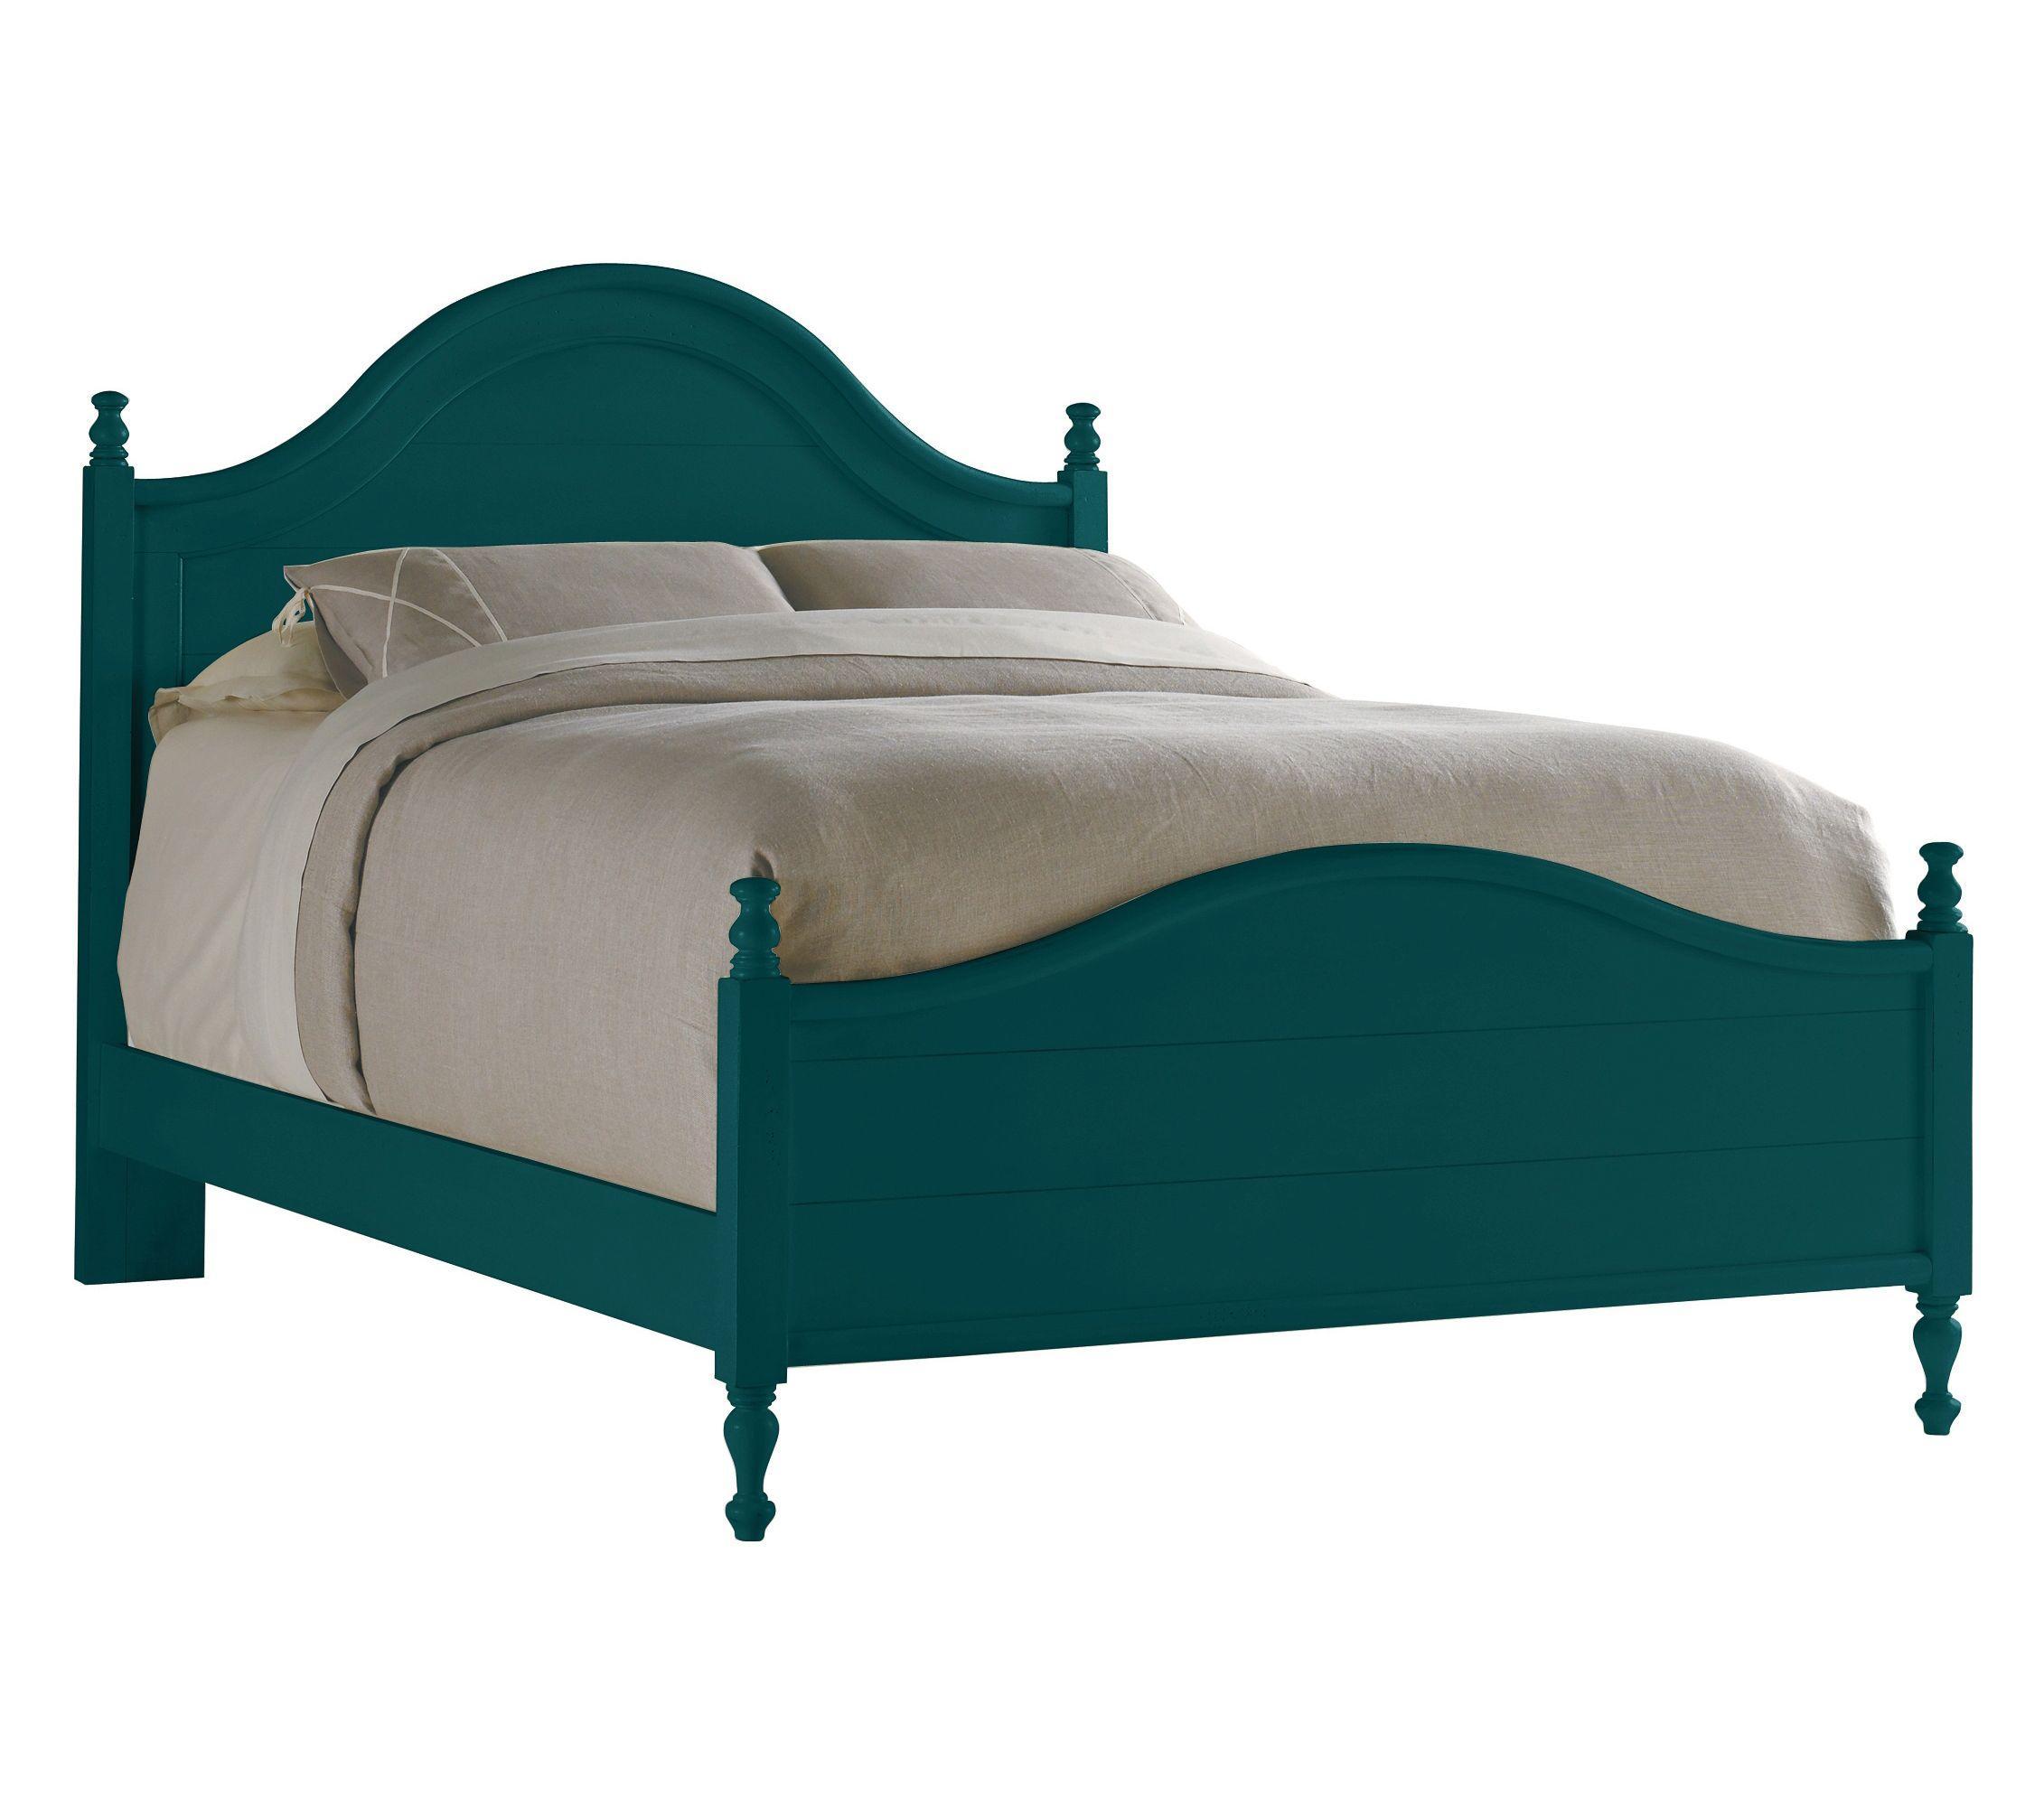 Stanley Furniture Coastal Living Retreat Queen Bungalow Bed - Item Number: 411-43-34